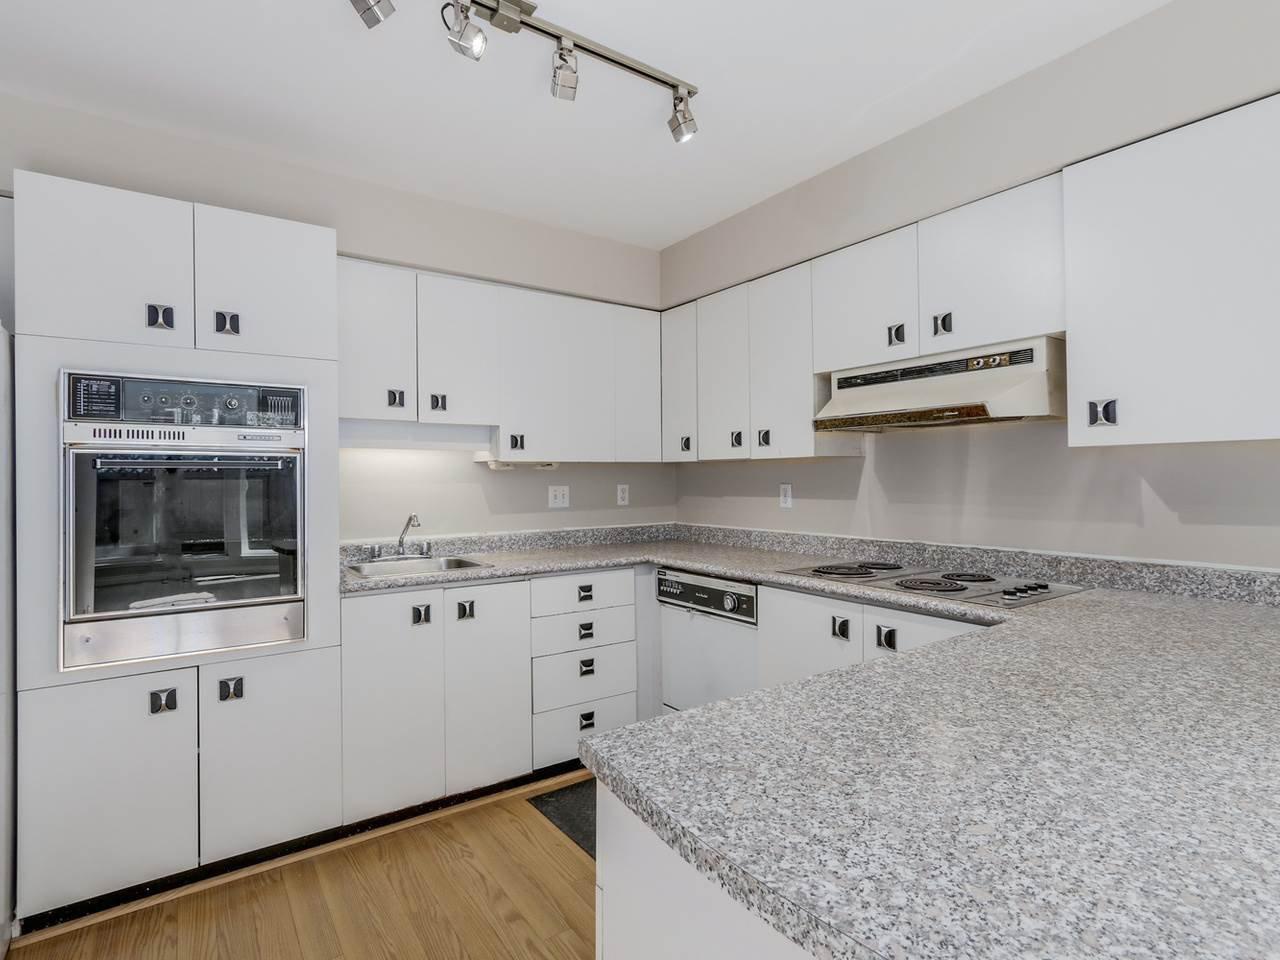 "Photo 11: Photos: 115 2125 YORK Avenue in Vancouver: Kitsilano Condo for sale in ""YORK GARDENS"" (Vancouver West)  : MLS®# R2054686"